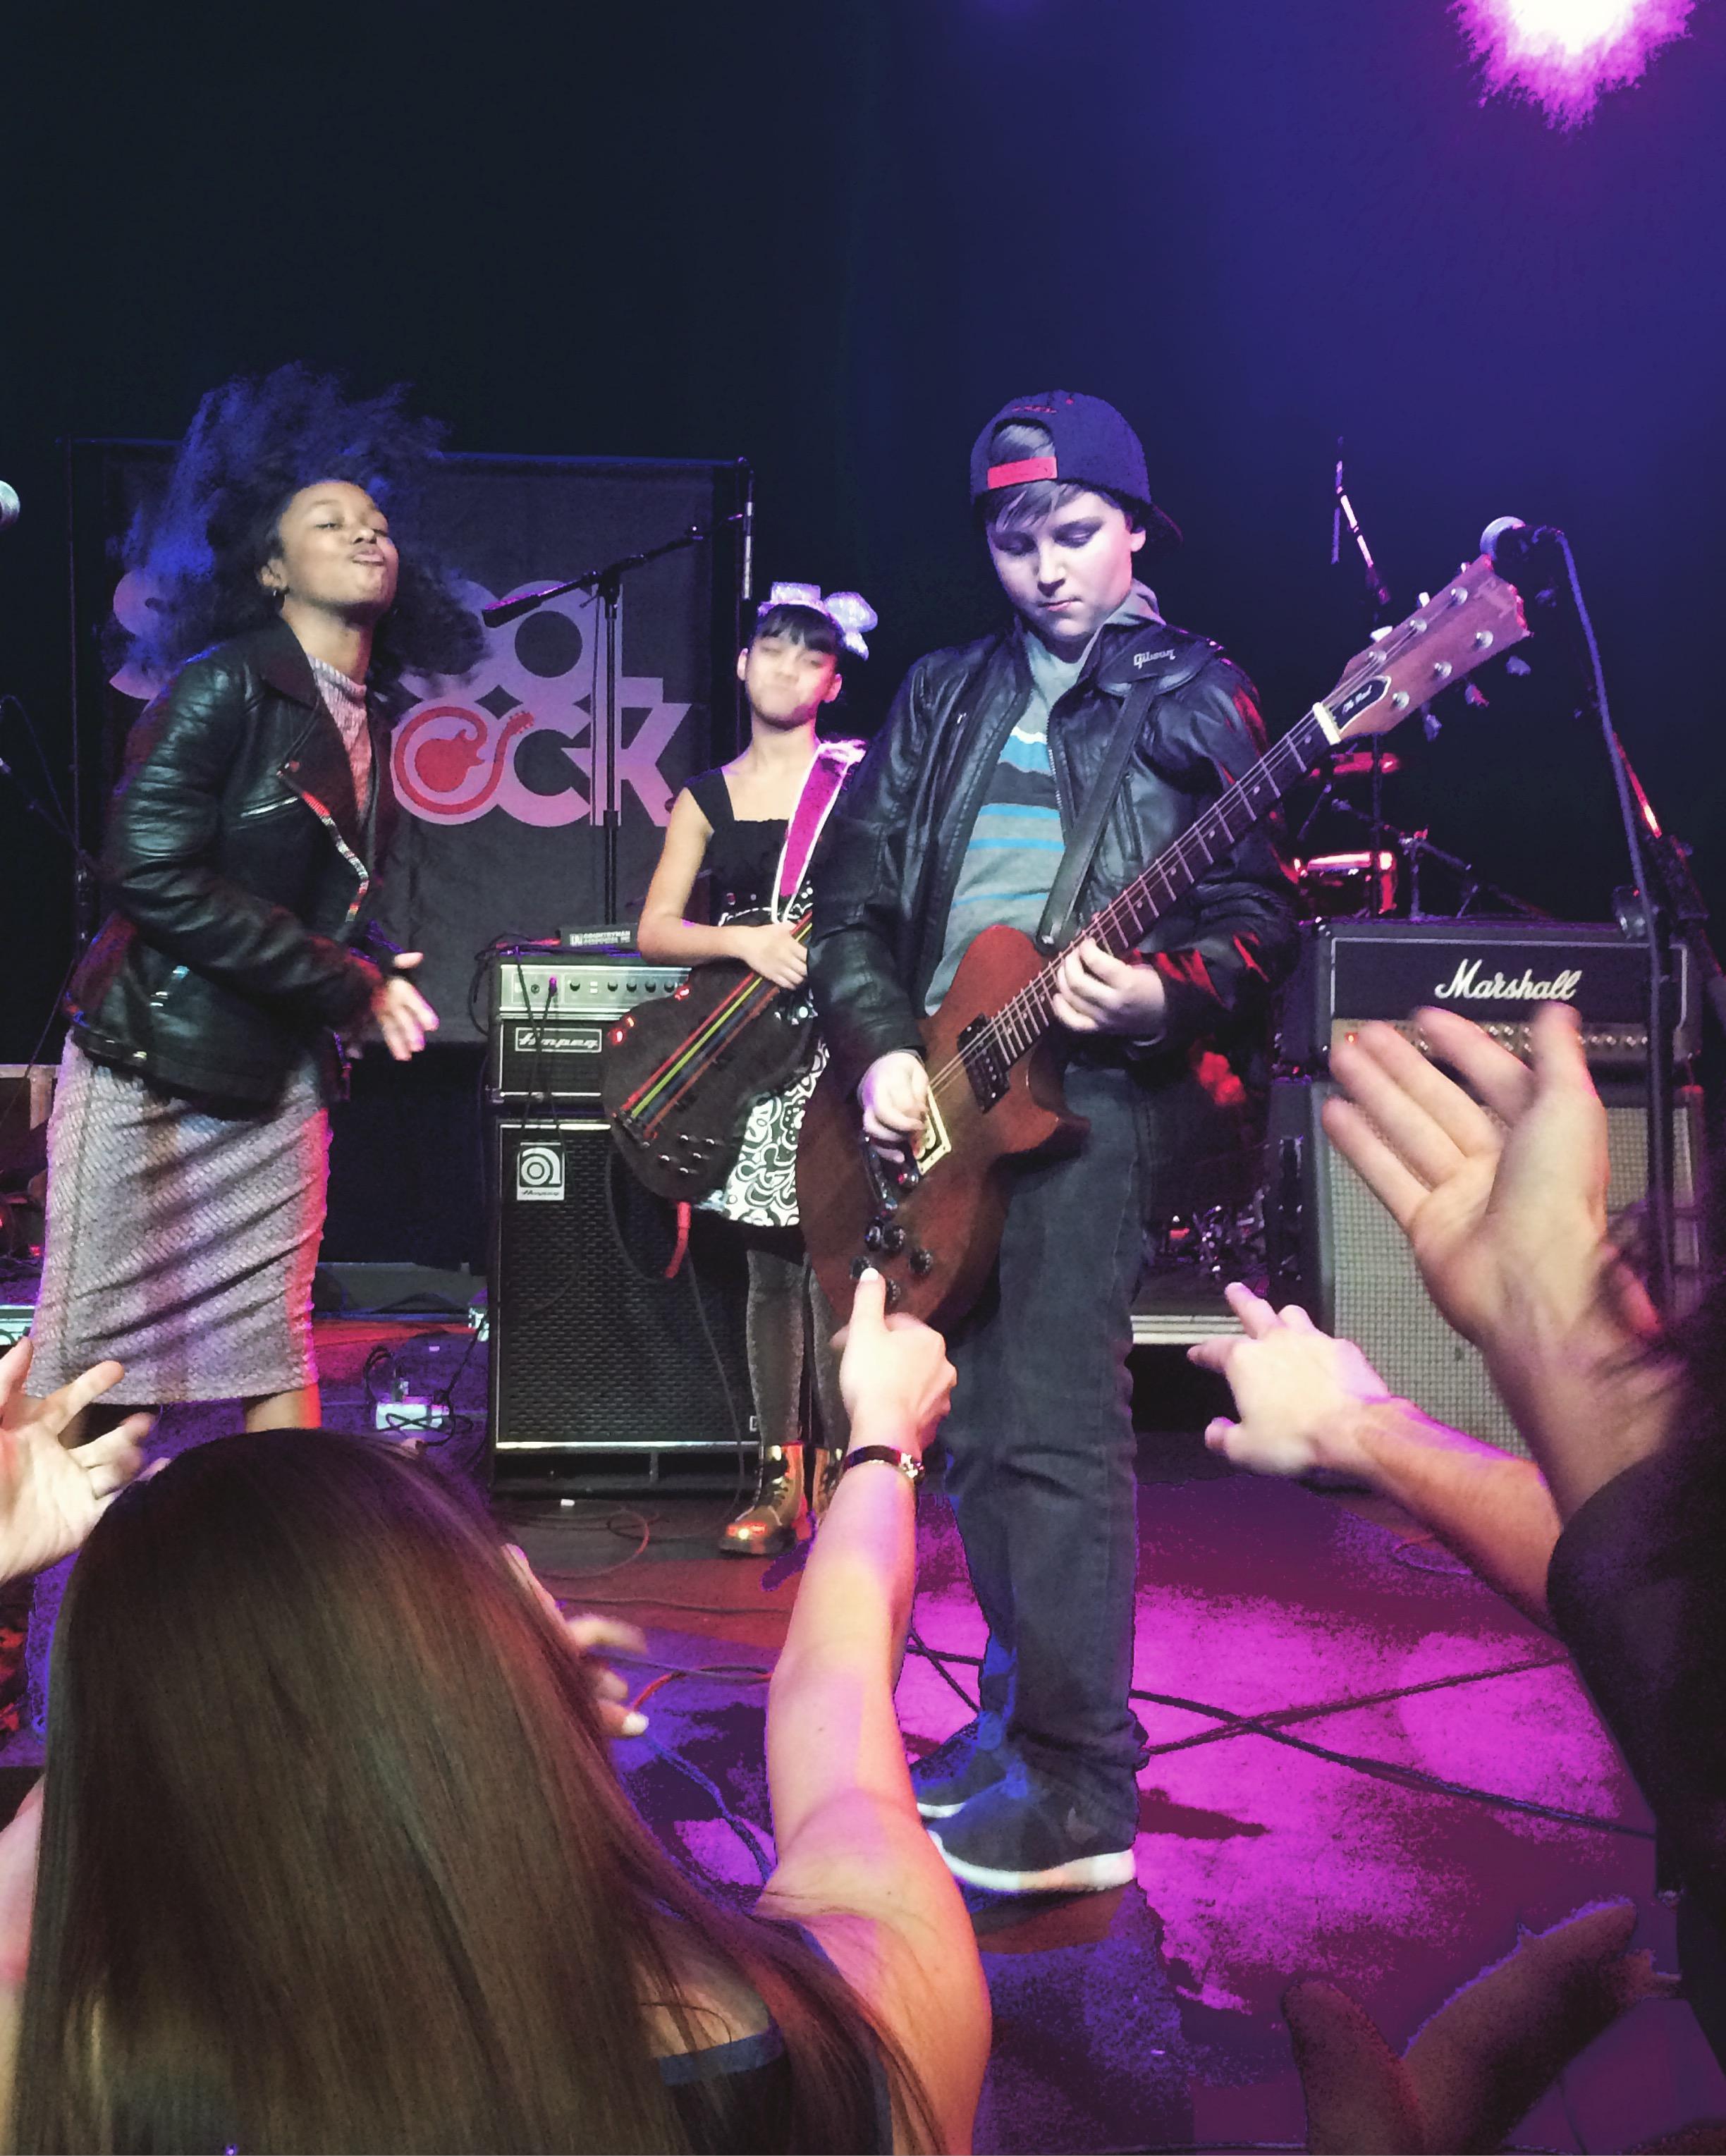 Jersey-Sullivan_hard-rock-cafe-benefit-guitar-1.jpg